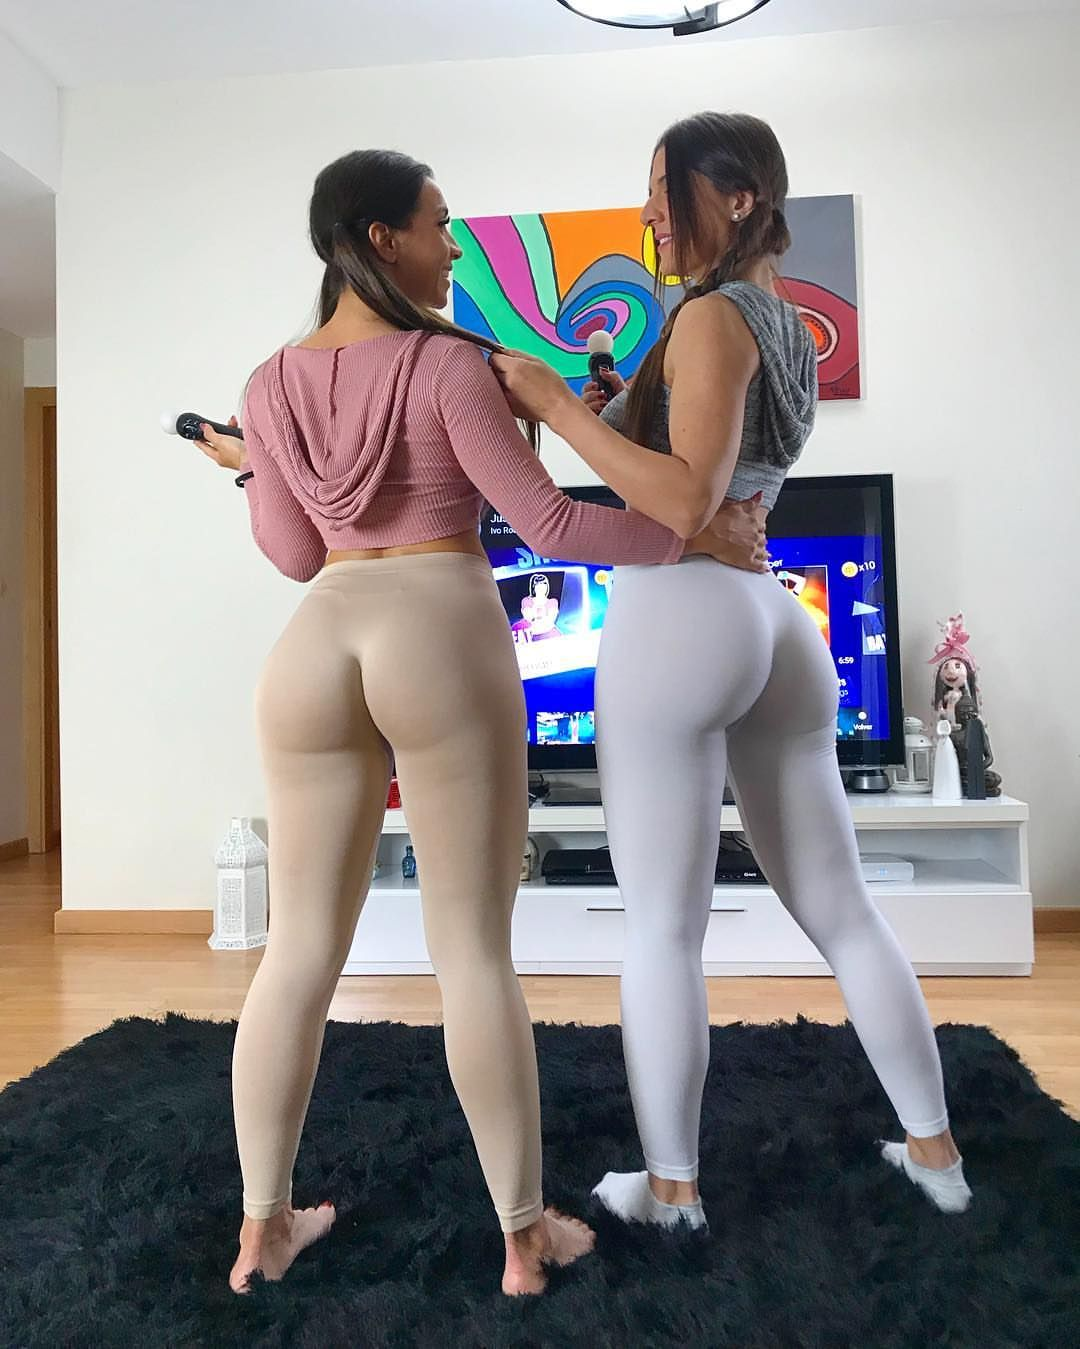 Celebrites Sonia Amat Sanchez nudes (86 photos), Topless, Leaked, Selfie, cleavage 2019